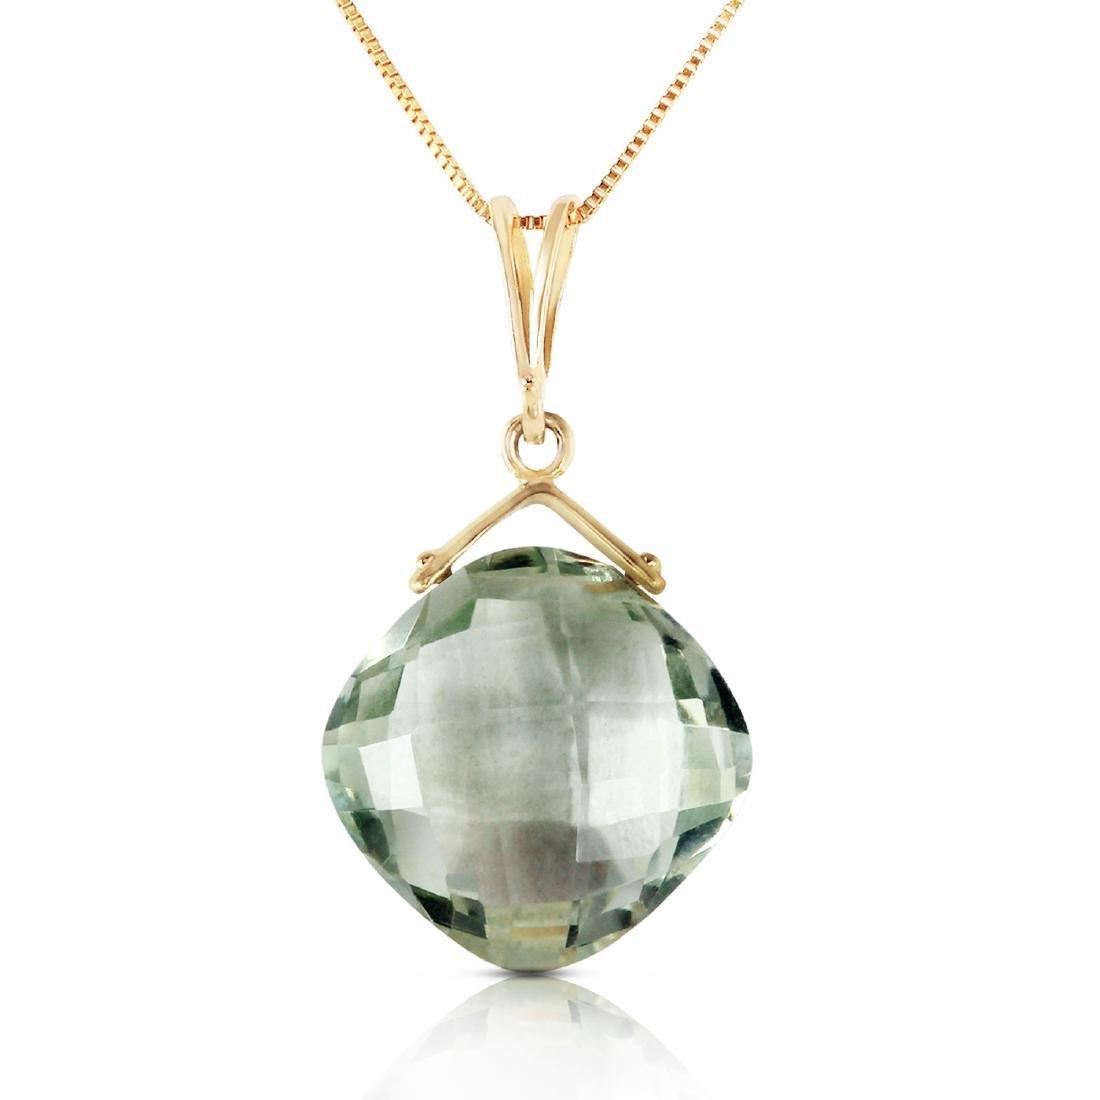 Genuine 8.75 ctw Green Amethyst Necklace Jewelry 14KT